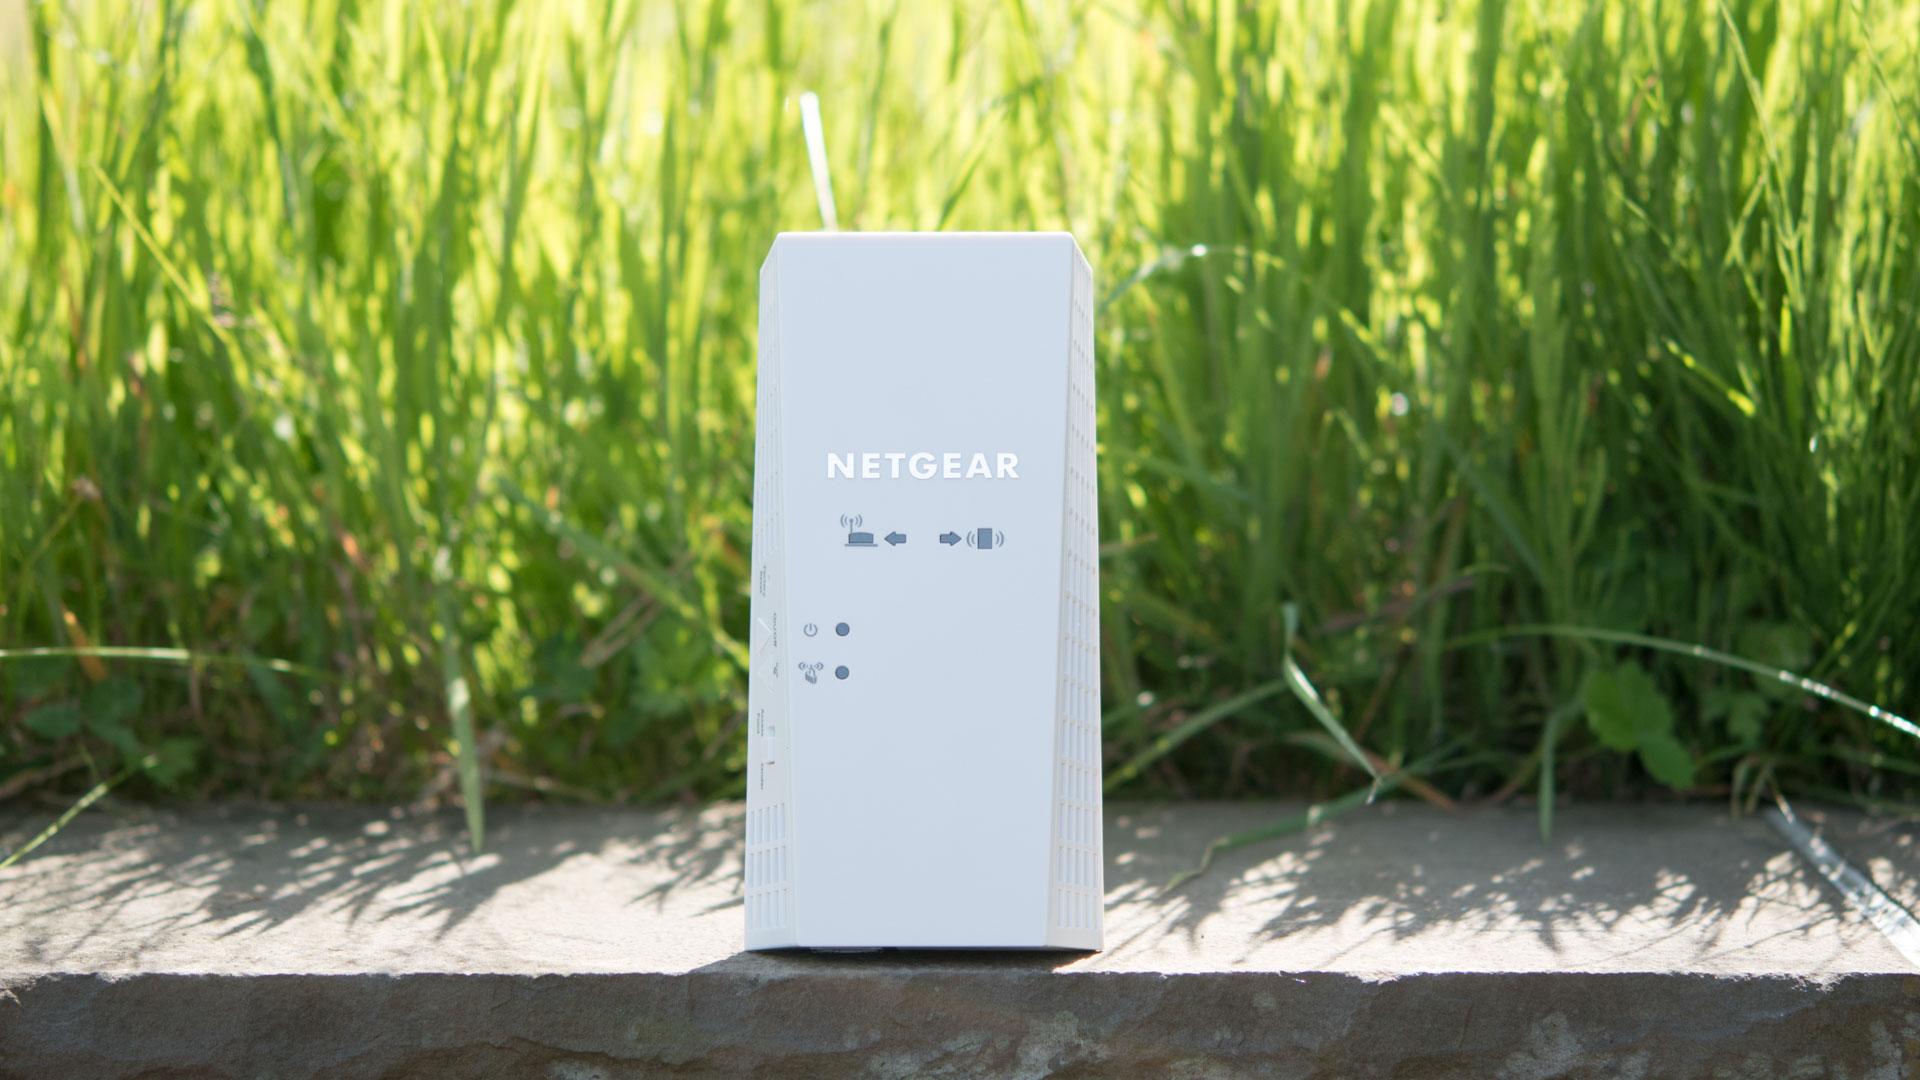 der netgear ex7300 nighthawk x4 wifi range extender im test techtest. Black Bedroom Furniture Sets. Home Design Ideas